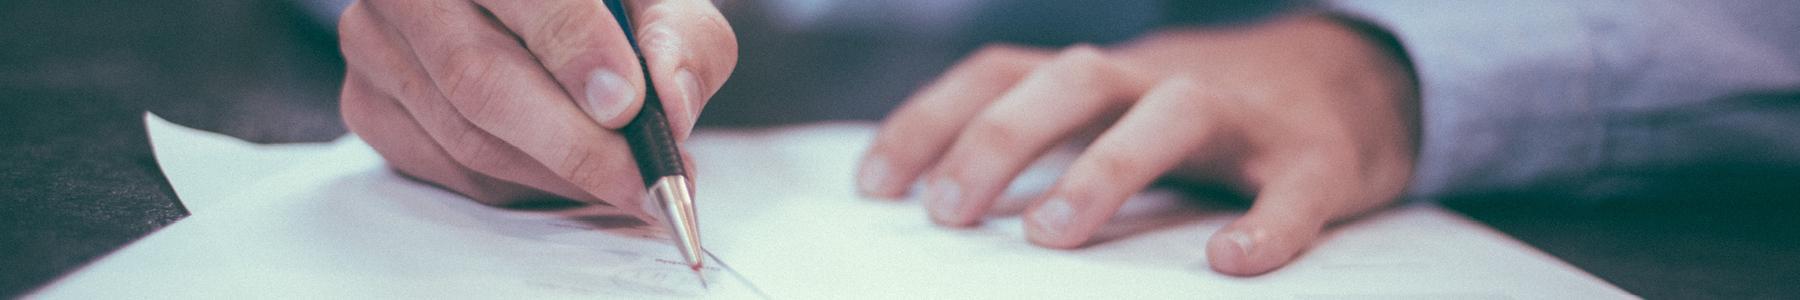 How To Prepare For Tax Season Thumbnail